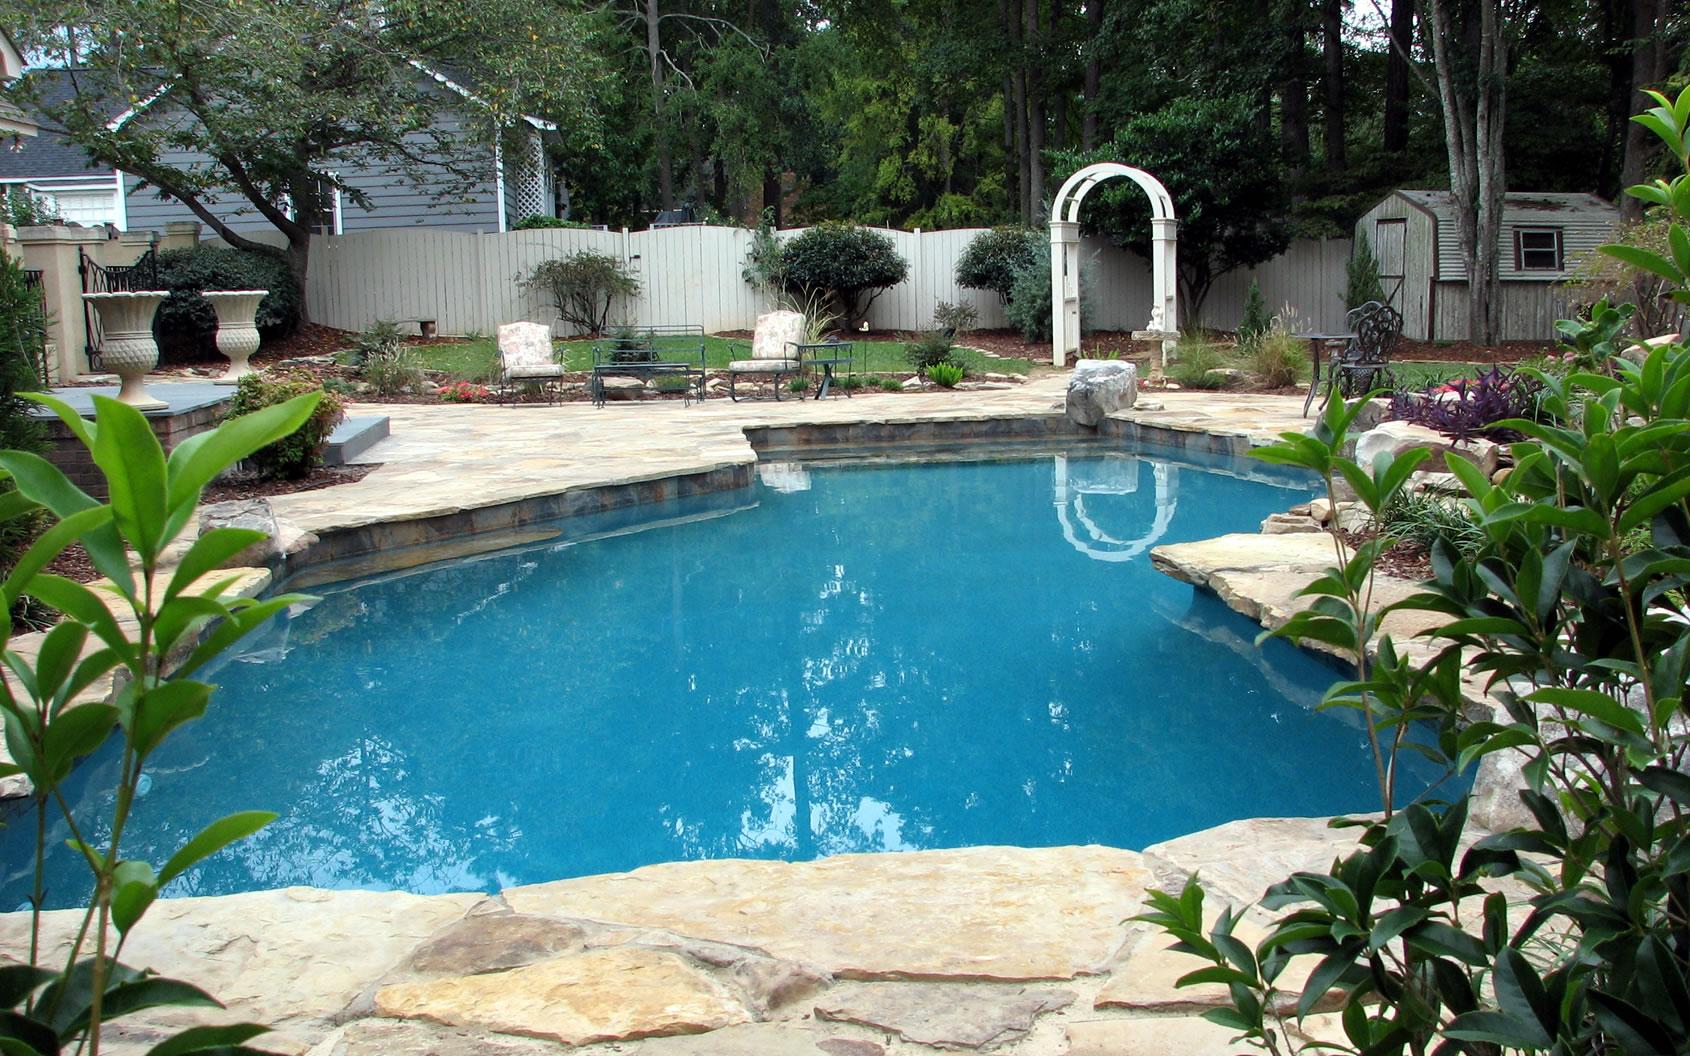 Residential Pools Amp Spas By Columbia And Charleston South Carolina Pool Designer Crystal Pools Llc